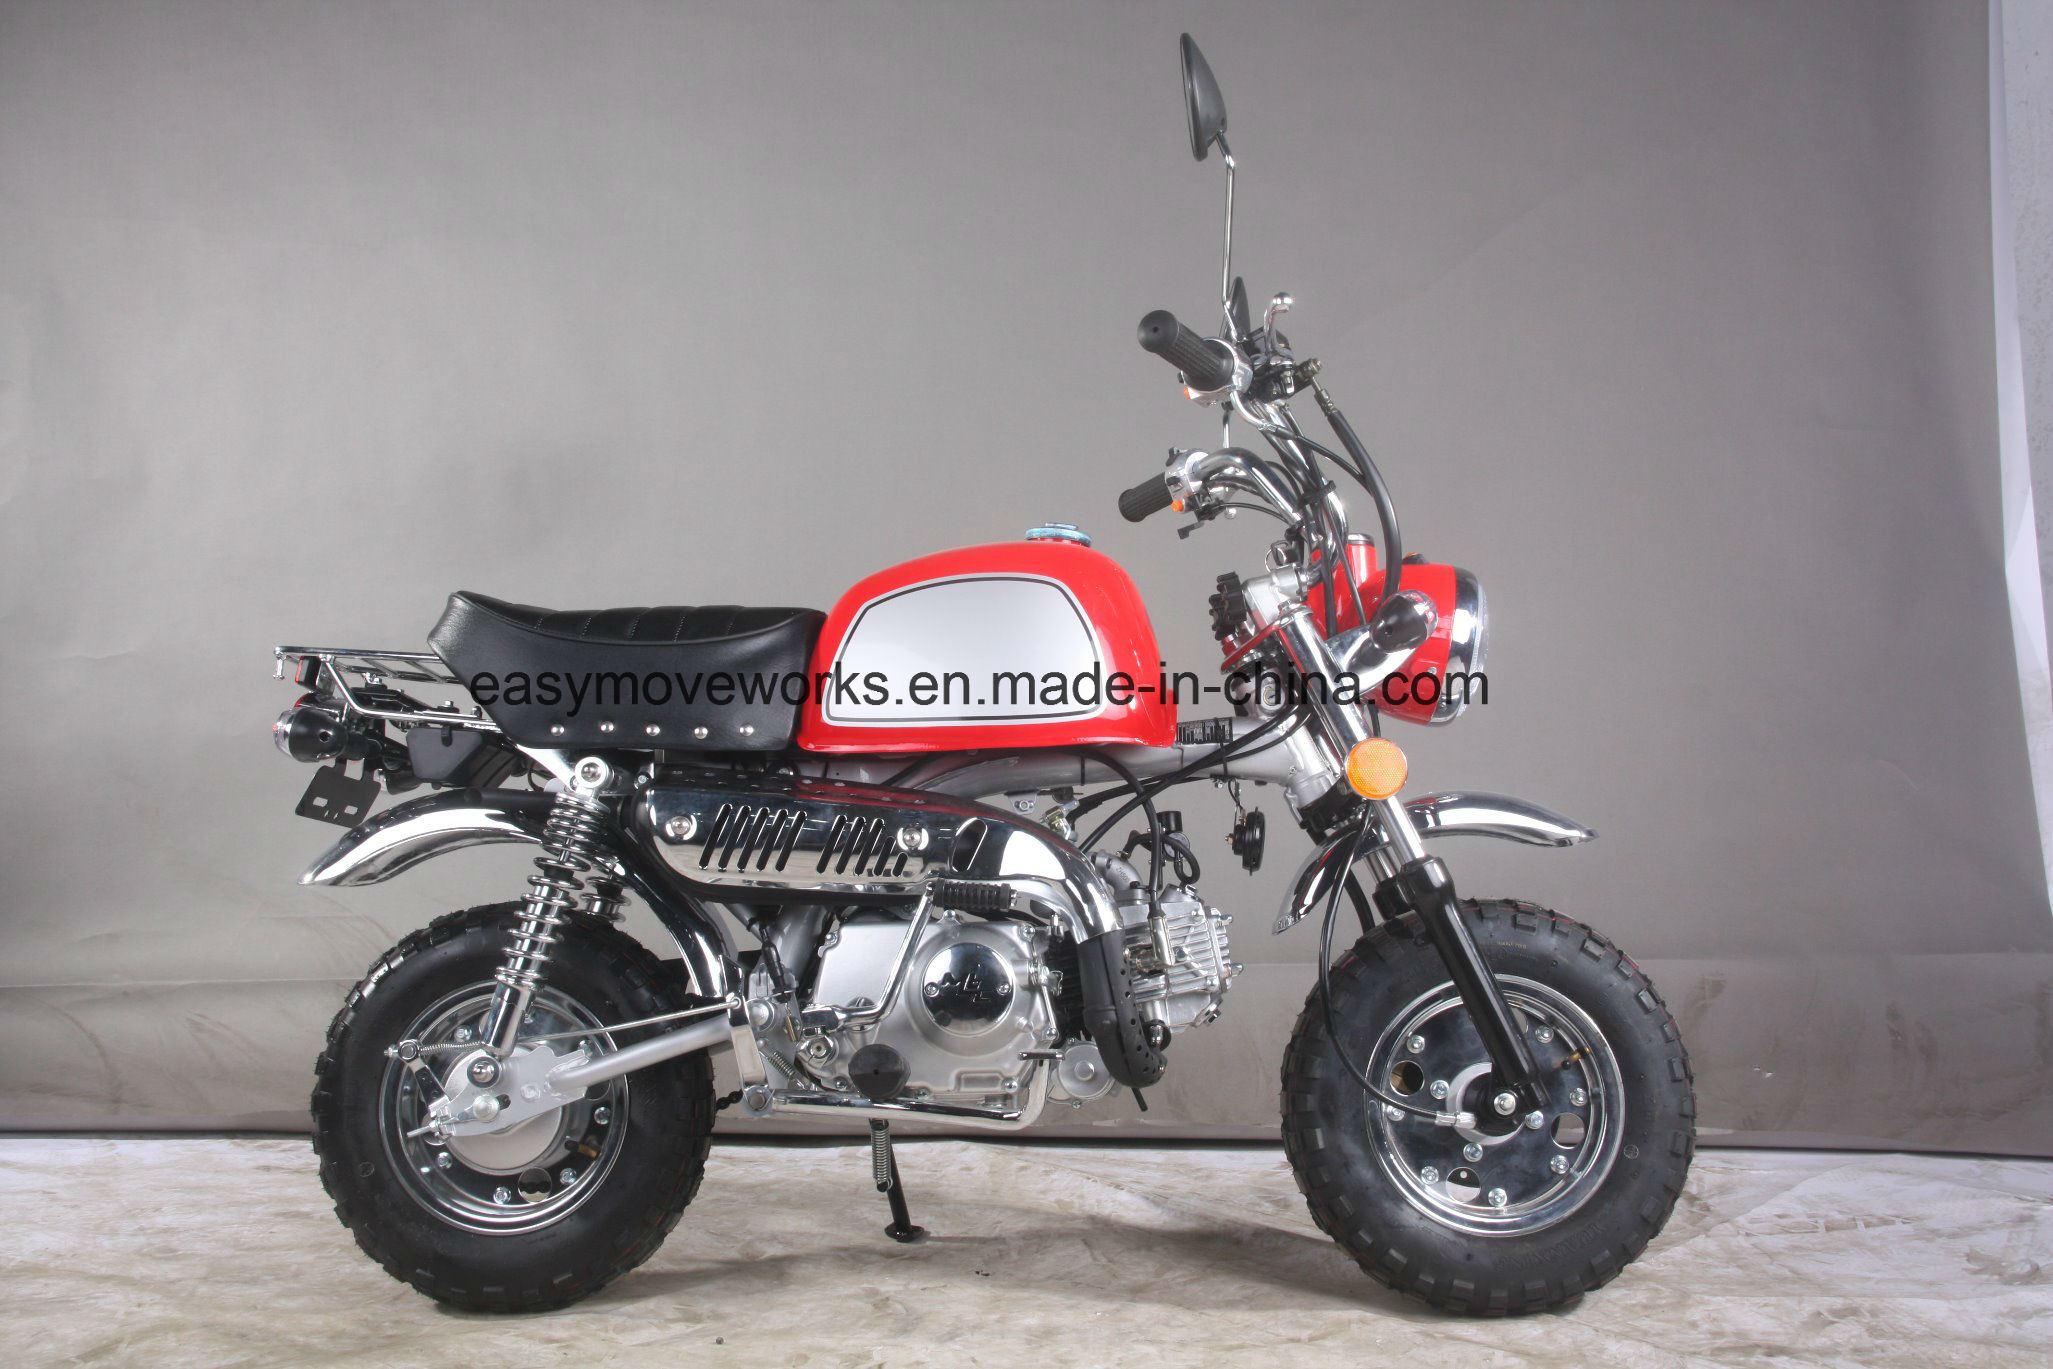 Zhenhua Classic Motorcycle Monkey Bike 125cc Euro4 Big Tank